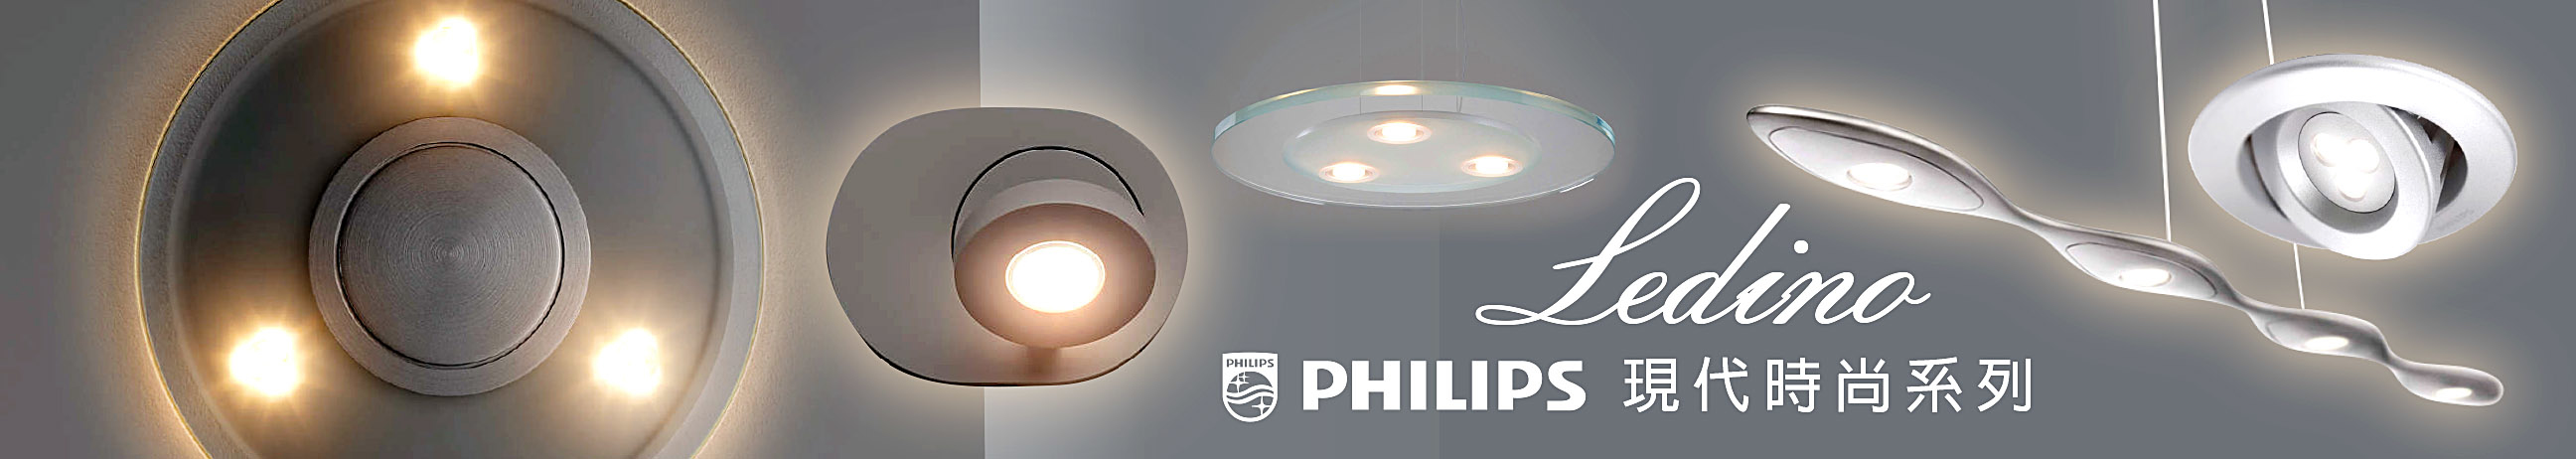 ledino,philips ceiling light,ceiling lamp,ceiling light,吸頂燈,飛利浦燈飾,吊燈,燈飾,led燈飾,philips ledino,天花燈,tplighting,galaxy lighting